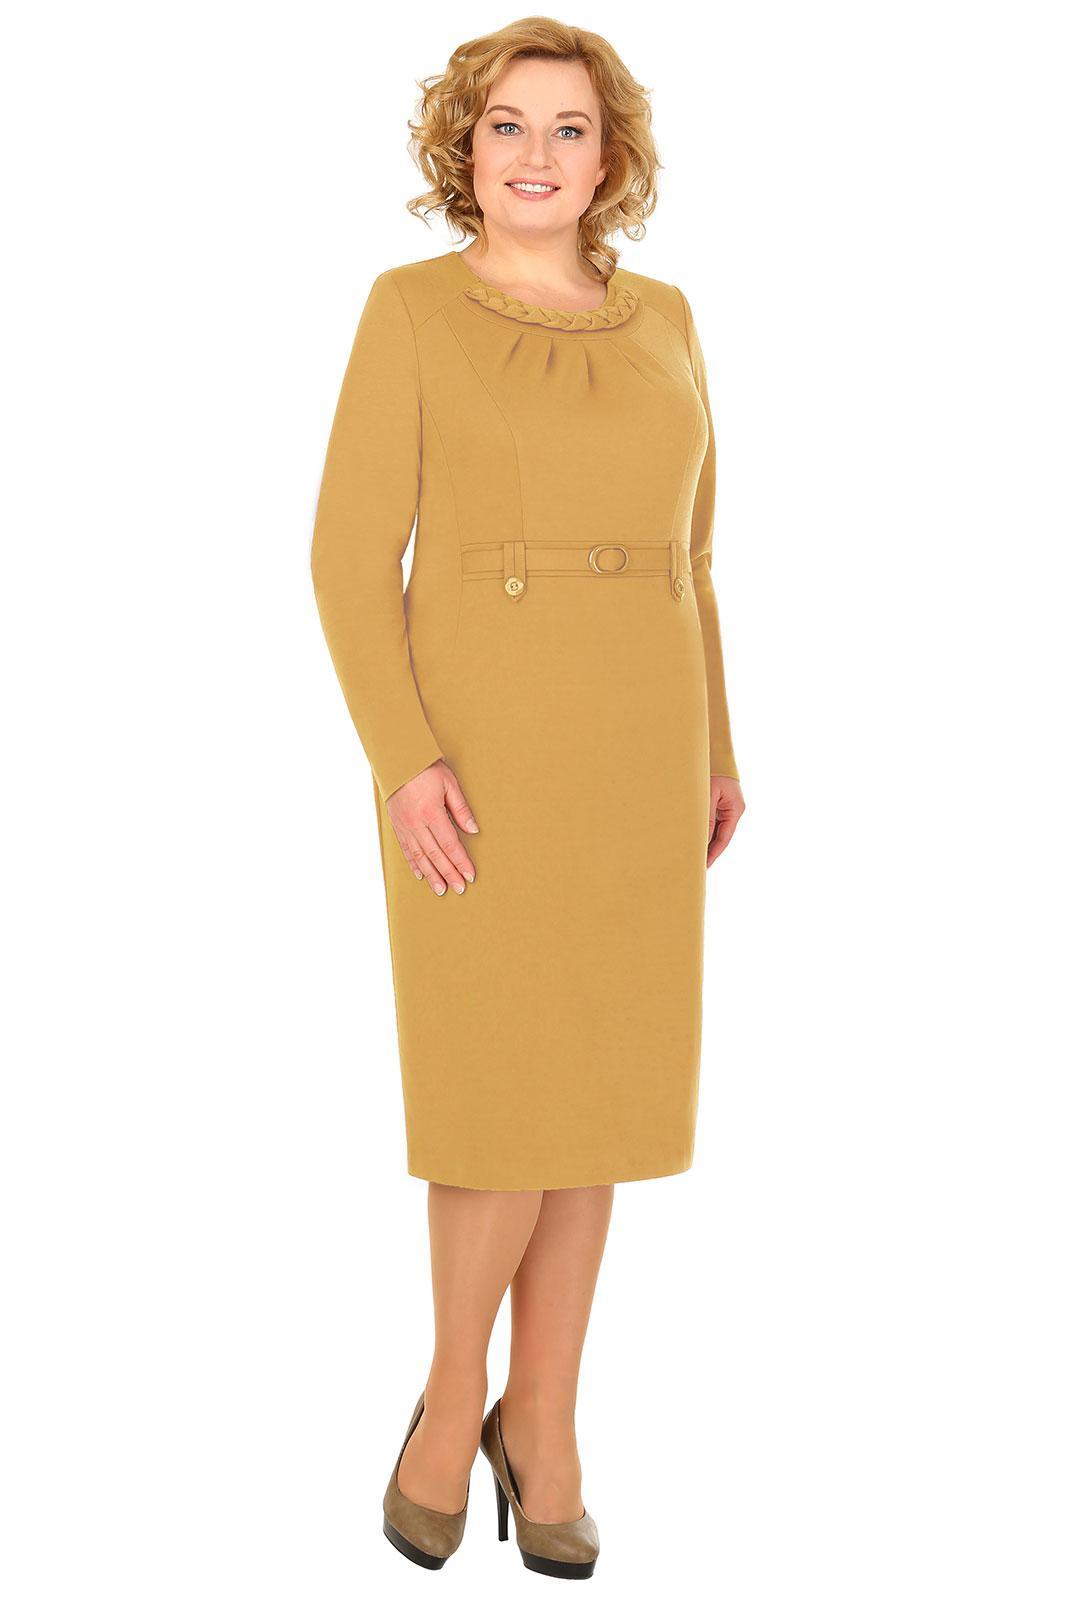 LIA3819 Smilškrāsas kleita